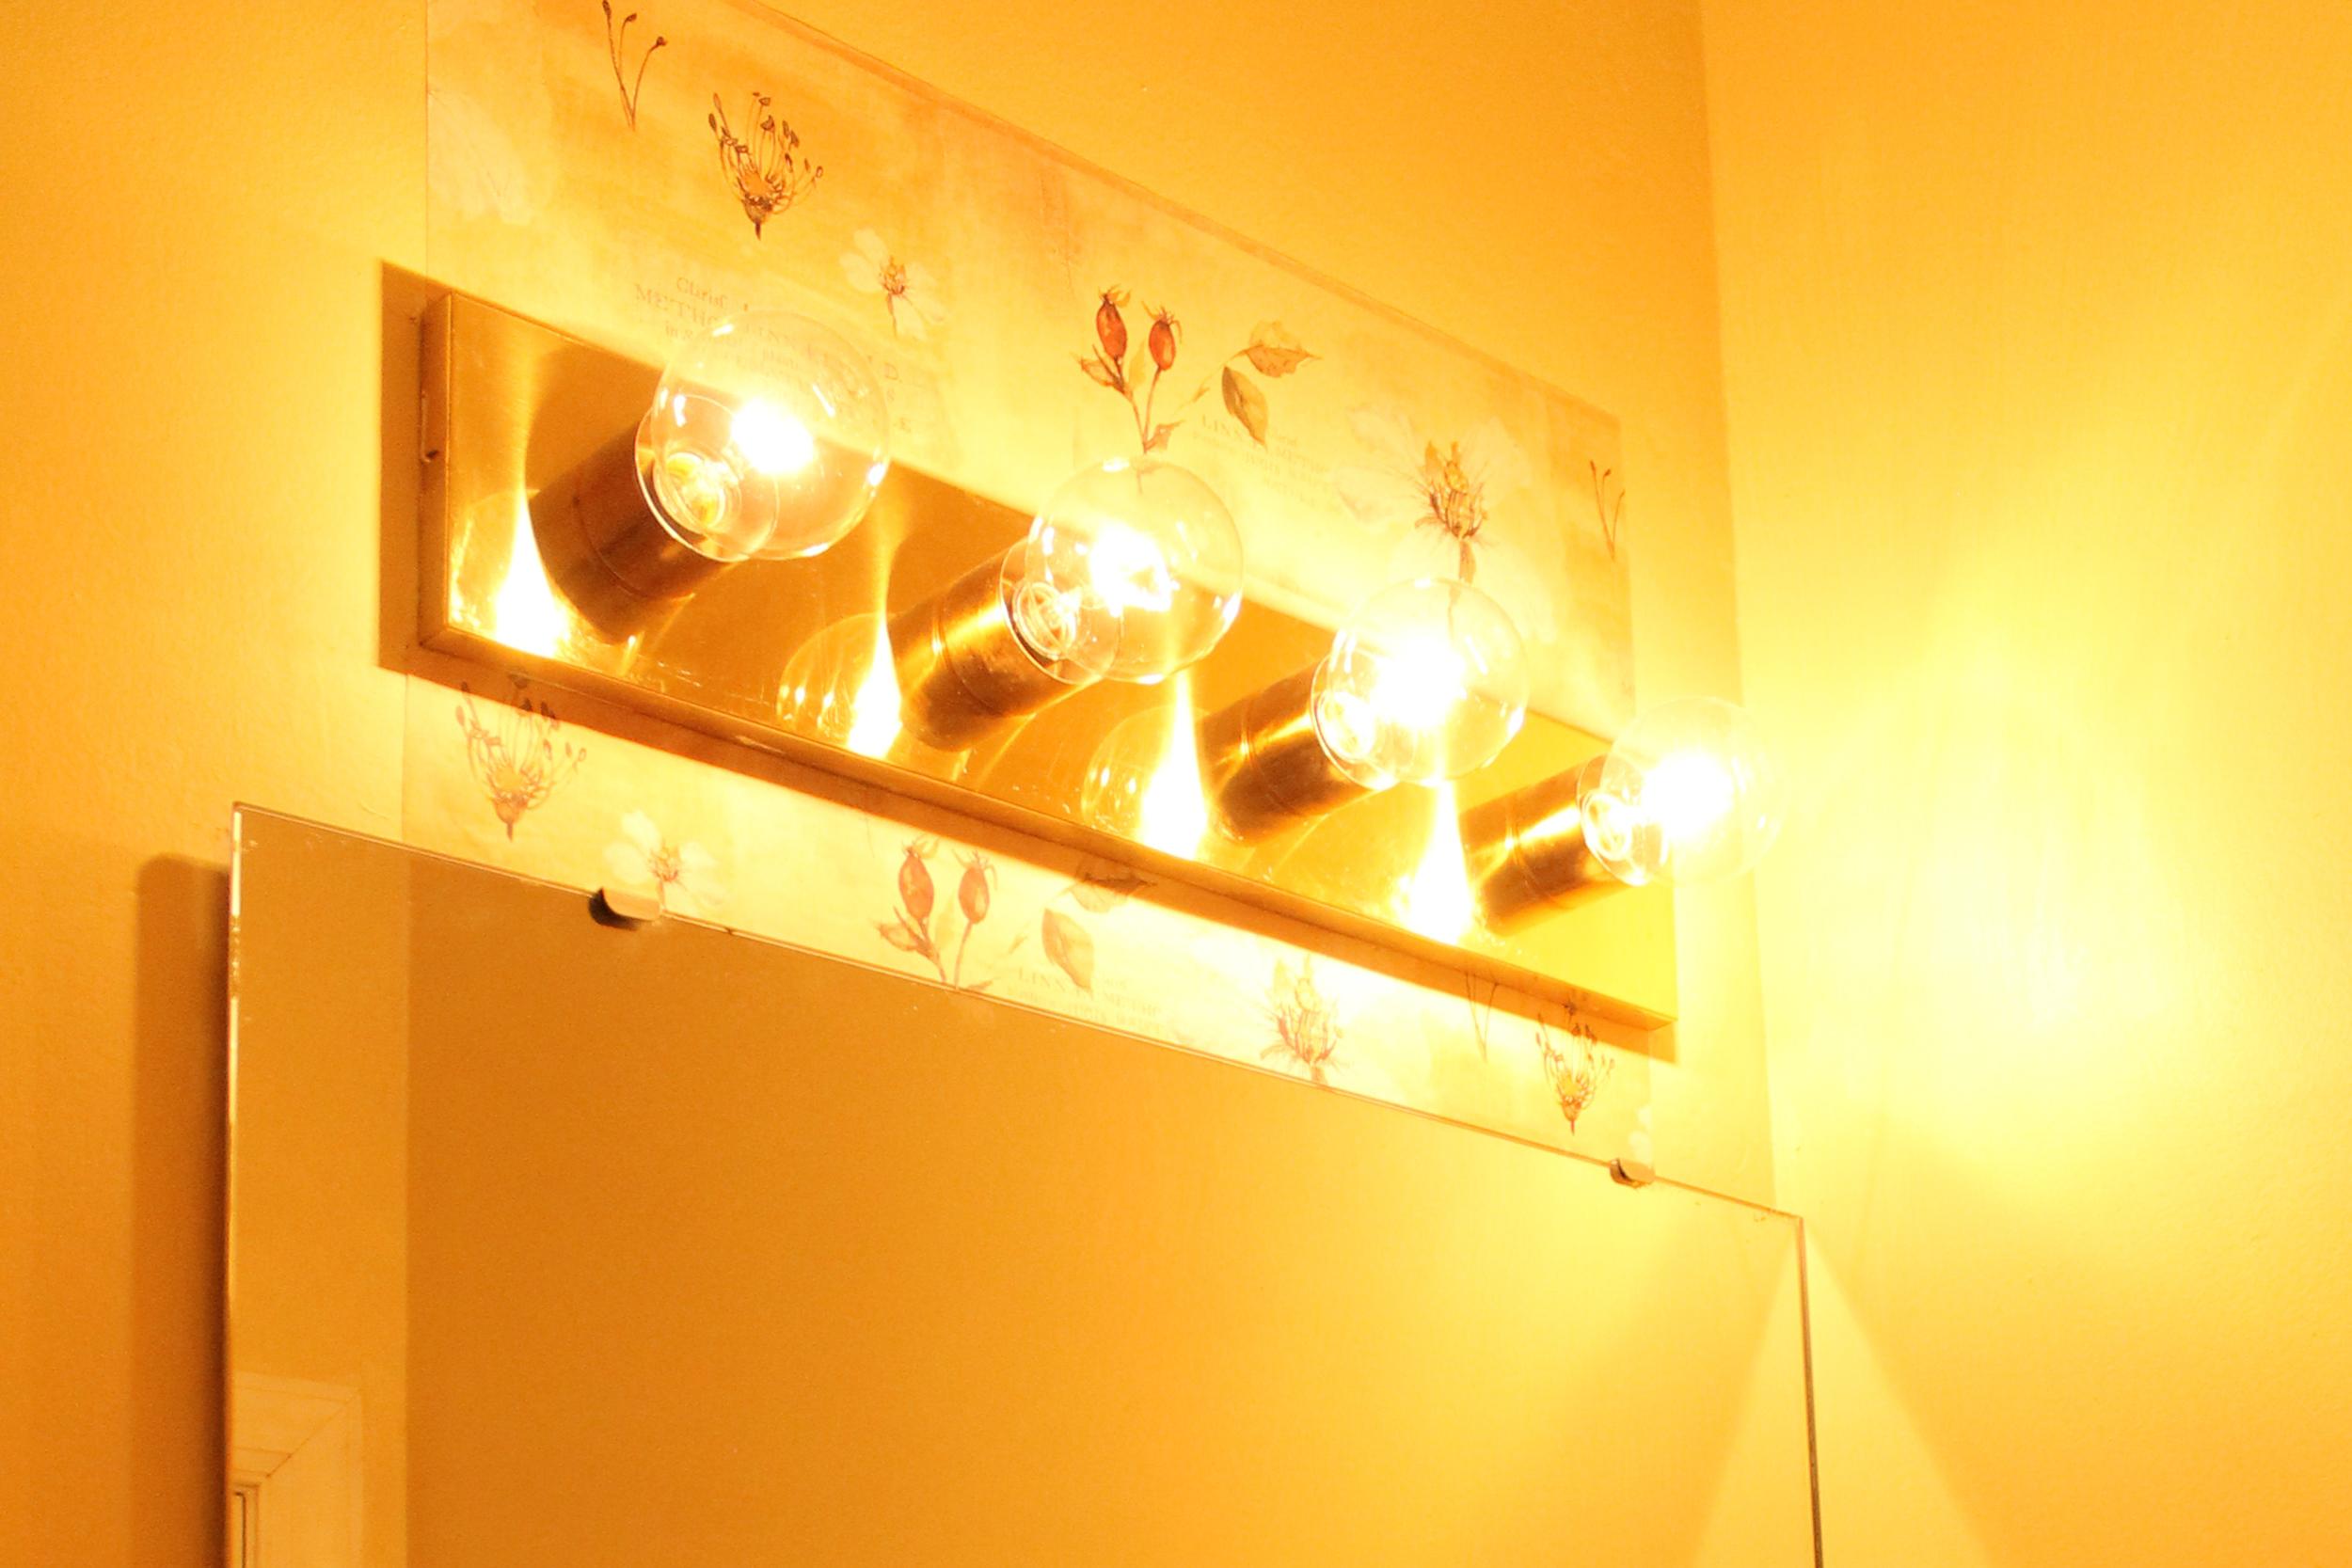 Elizabeth Burns Desgin | Budget Friendly Powder Room Makeover for $200